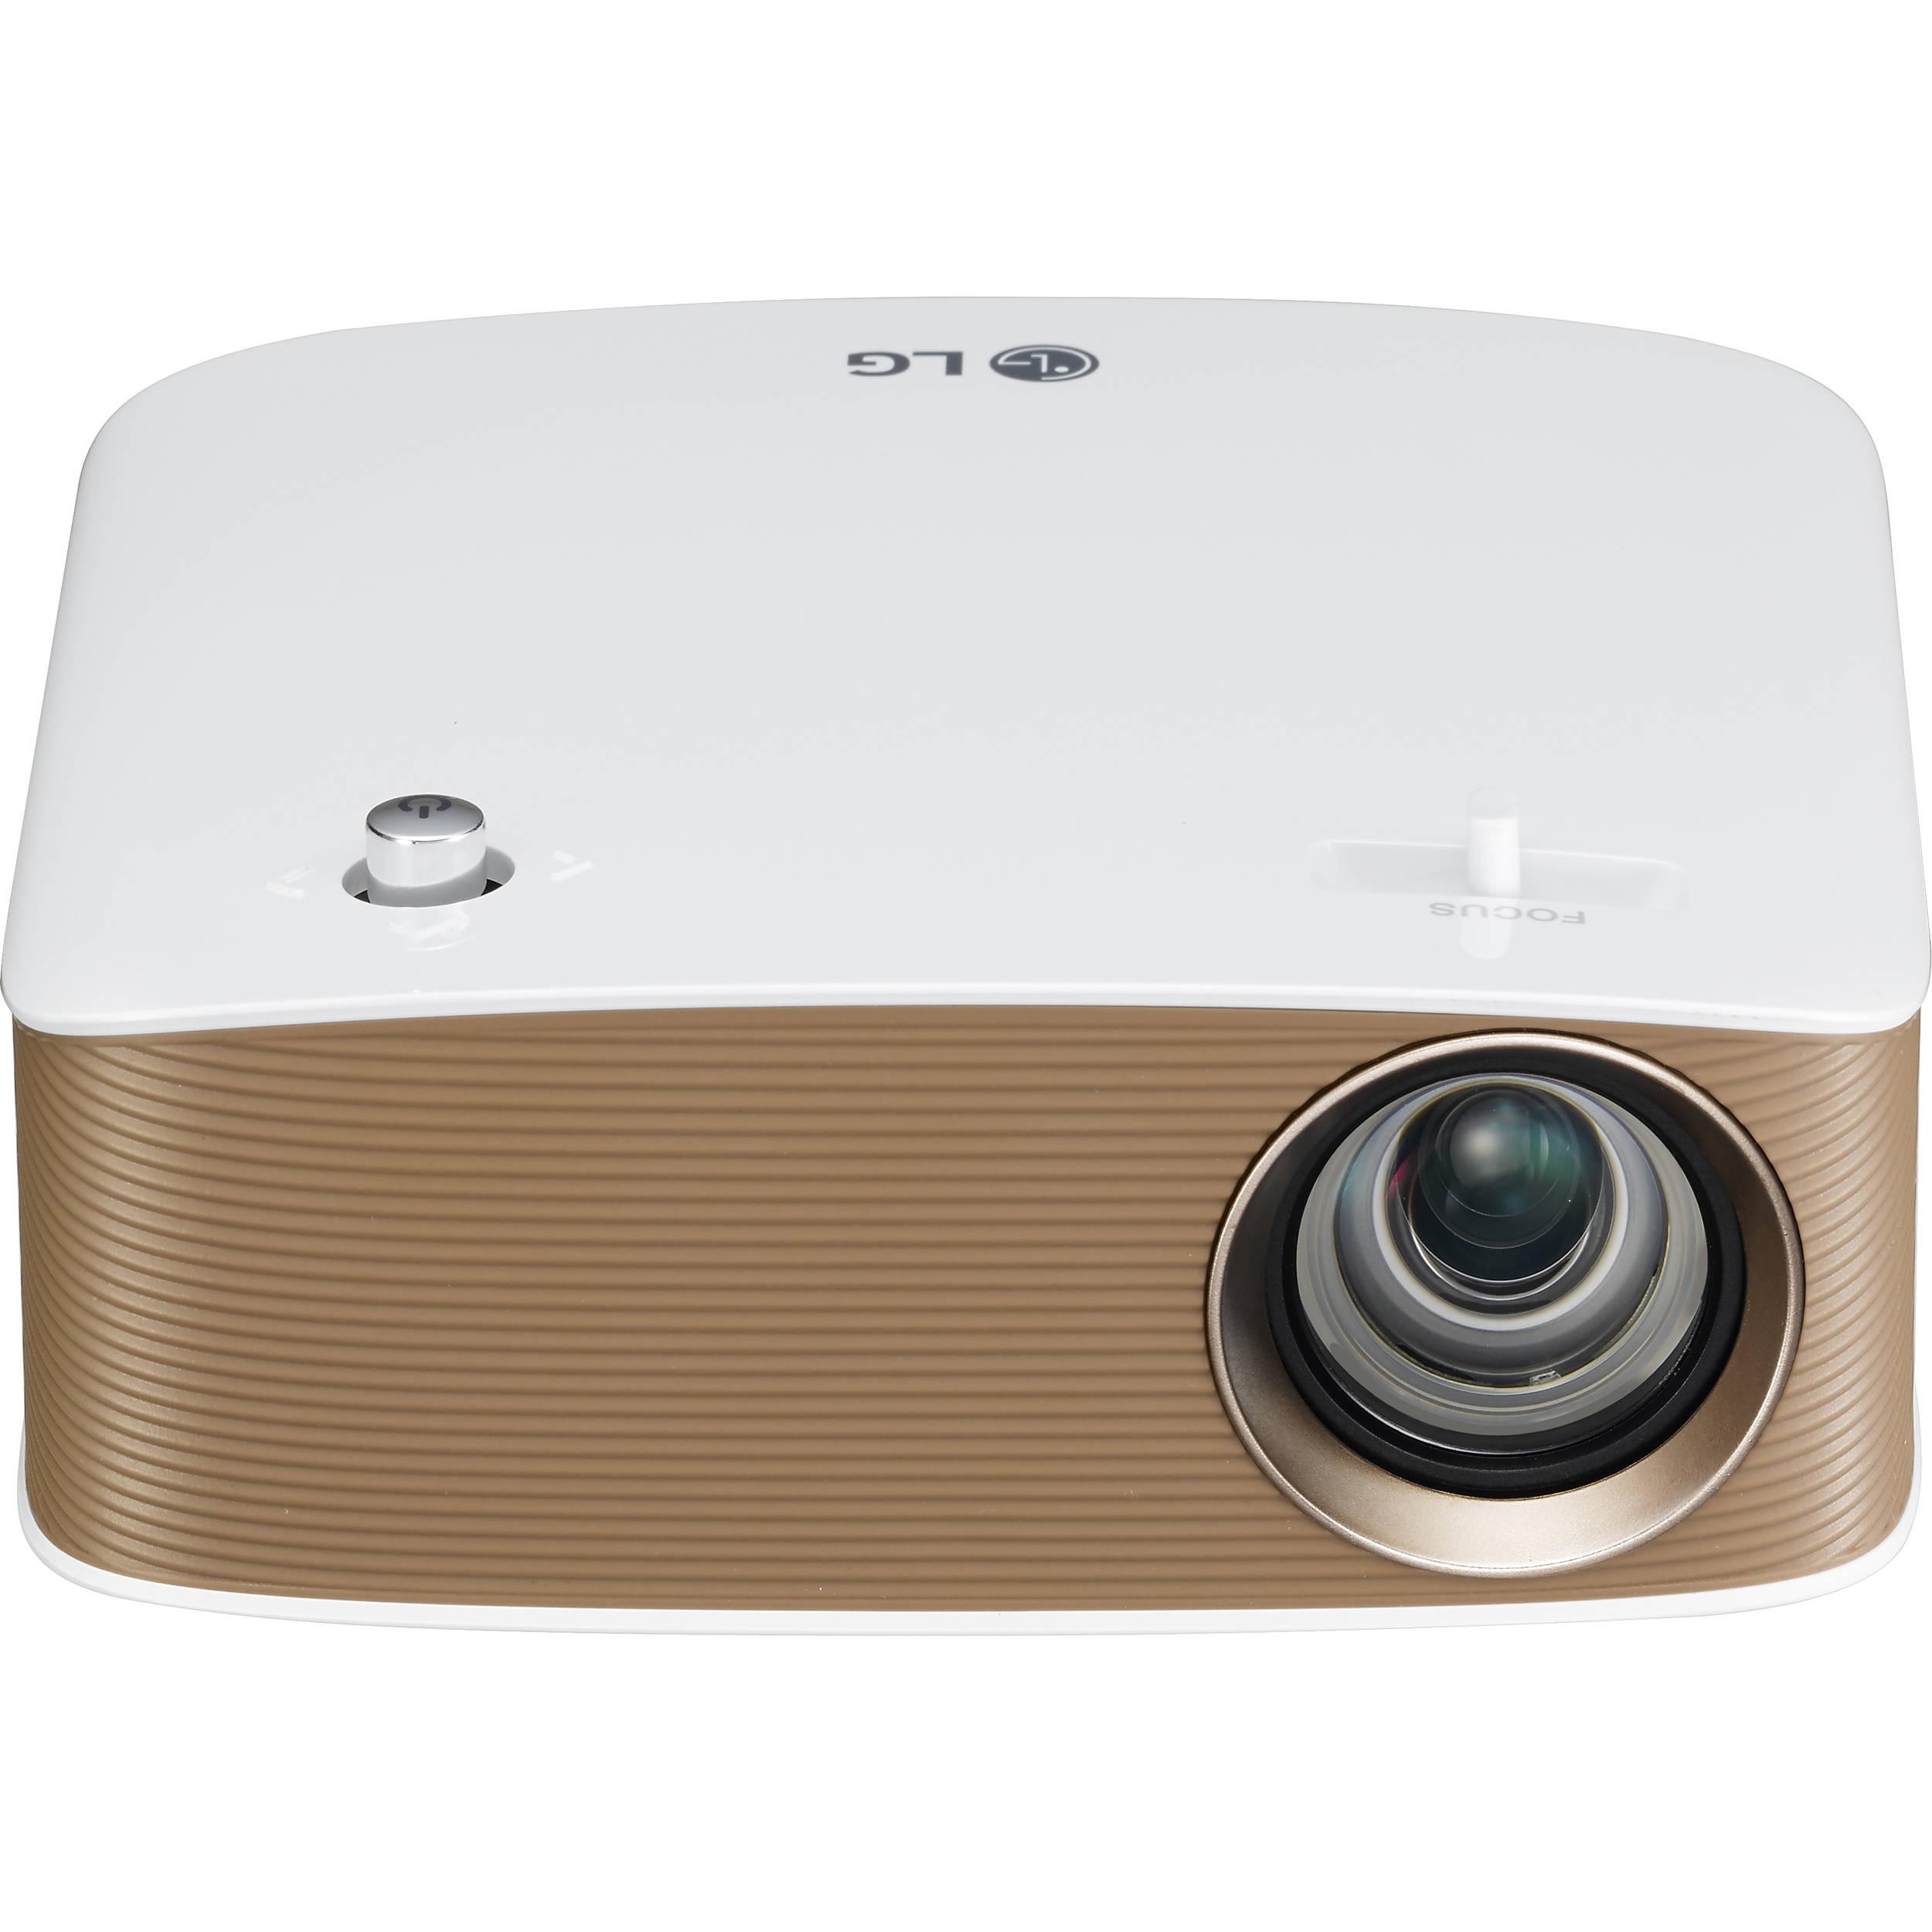 Lg minibeam nano 130 lumen hd lcos pico projector ph150g b h for Hd pico projector